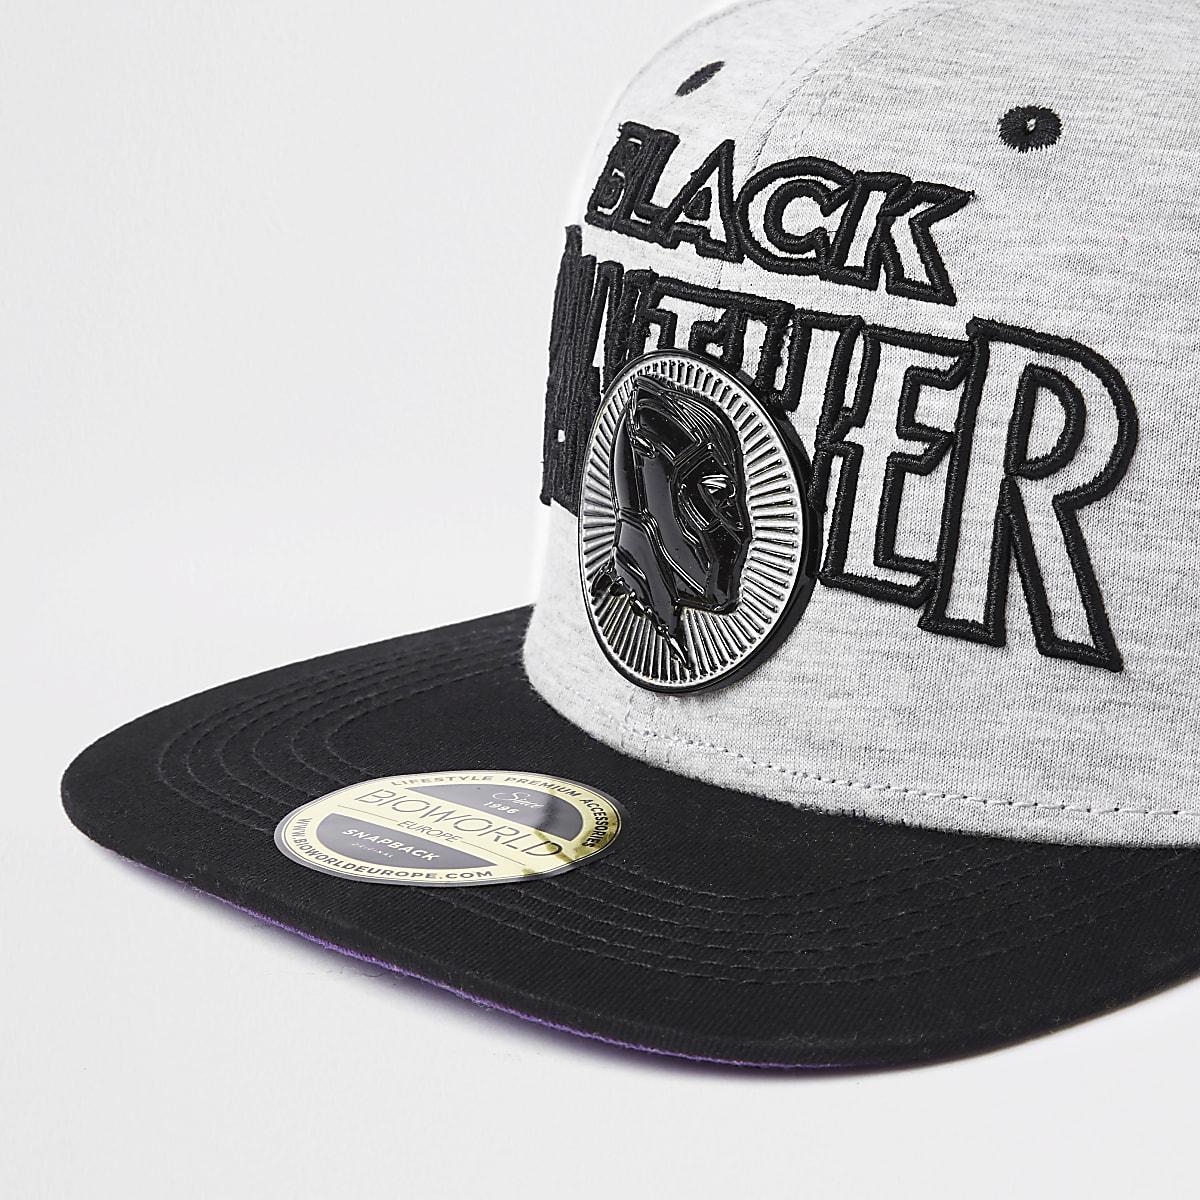 5a2a3fe59 Grey 'Black Panther' snapback cap